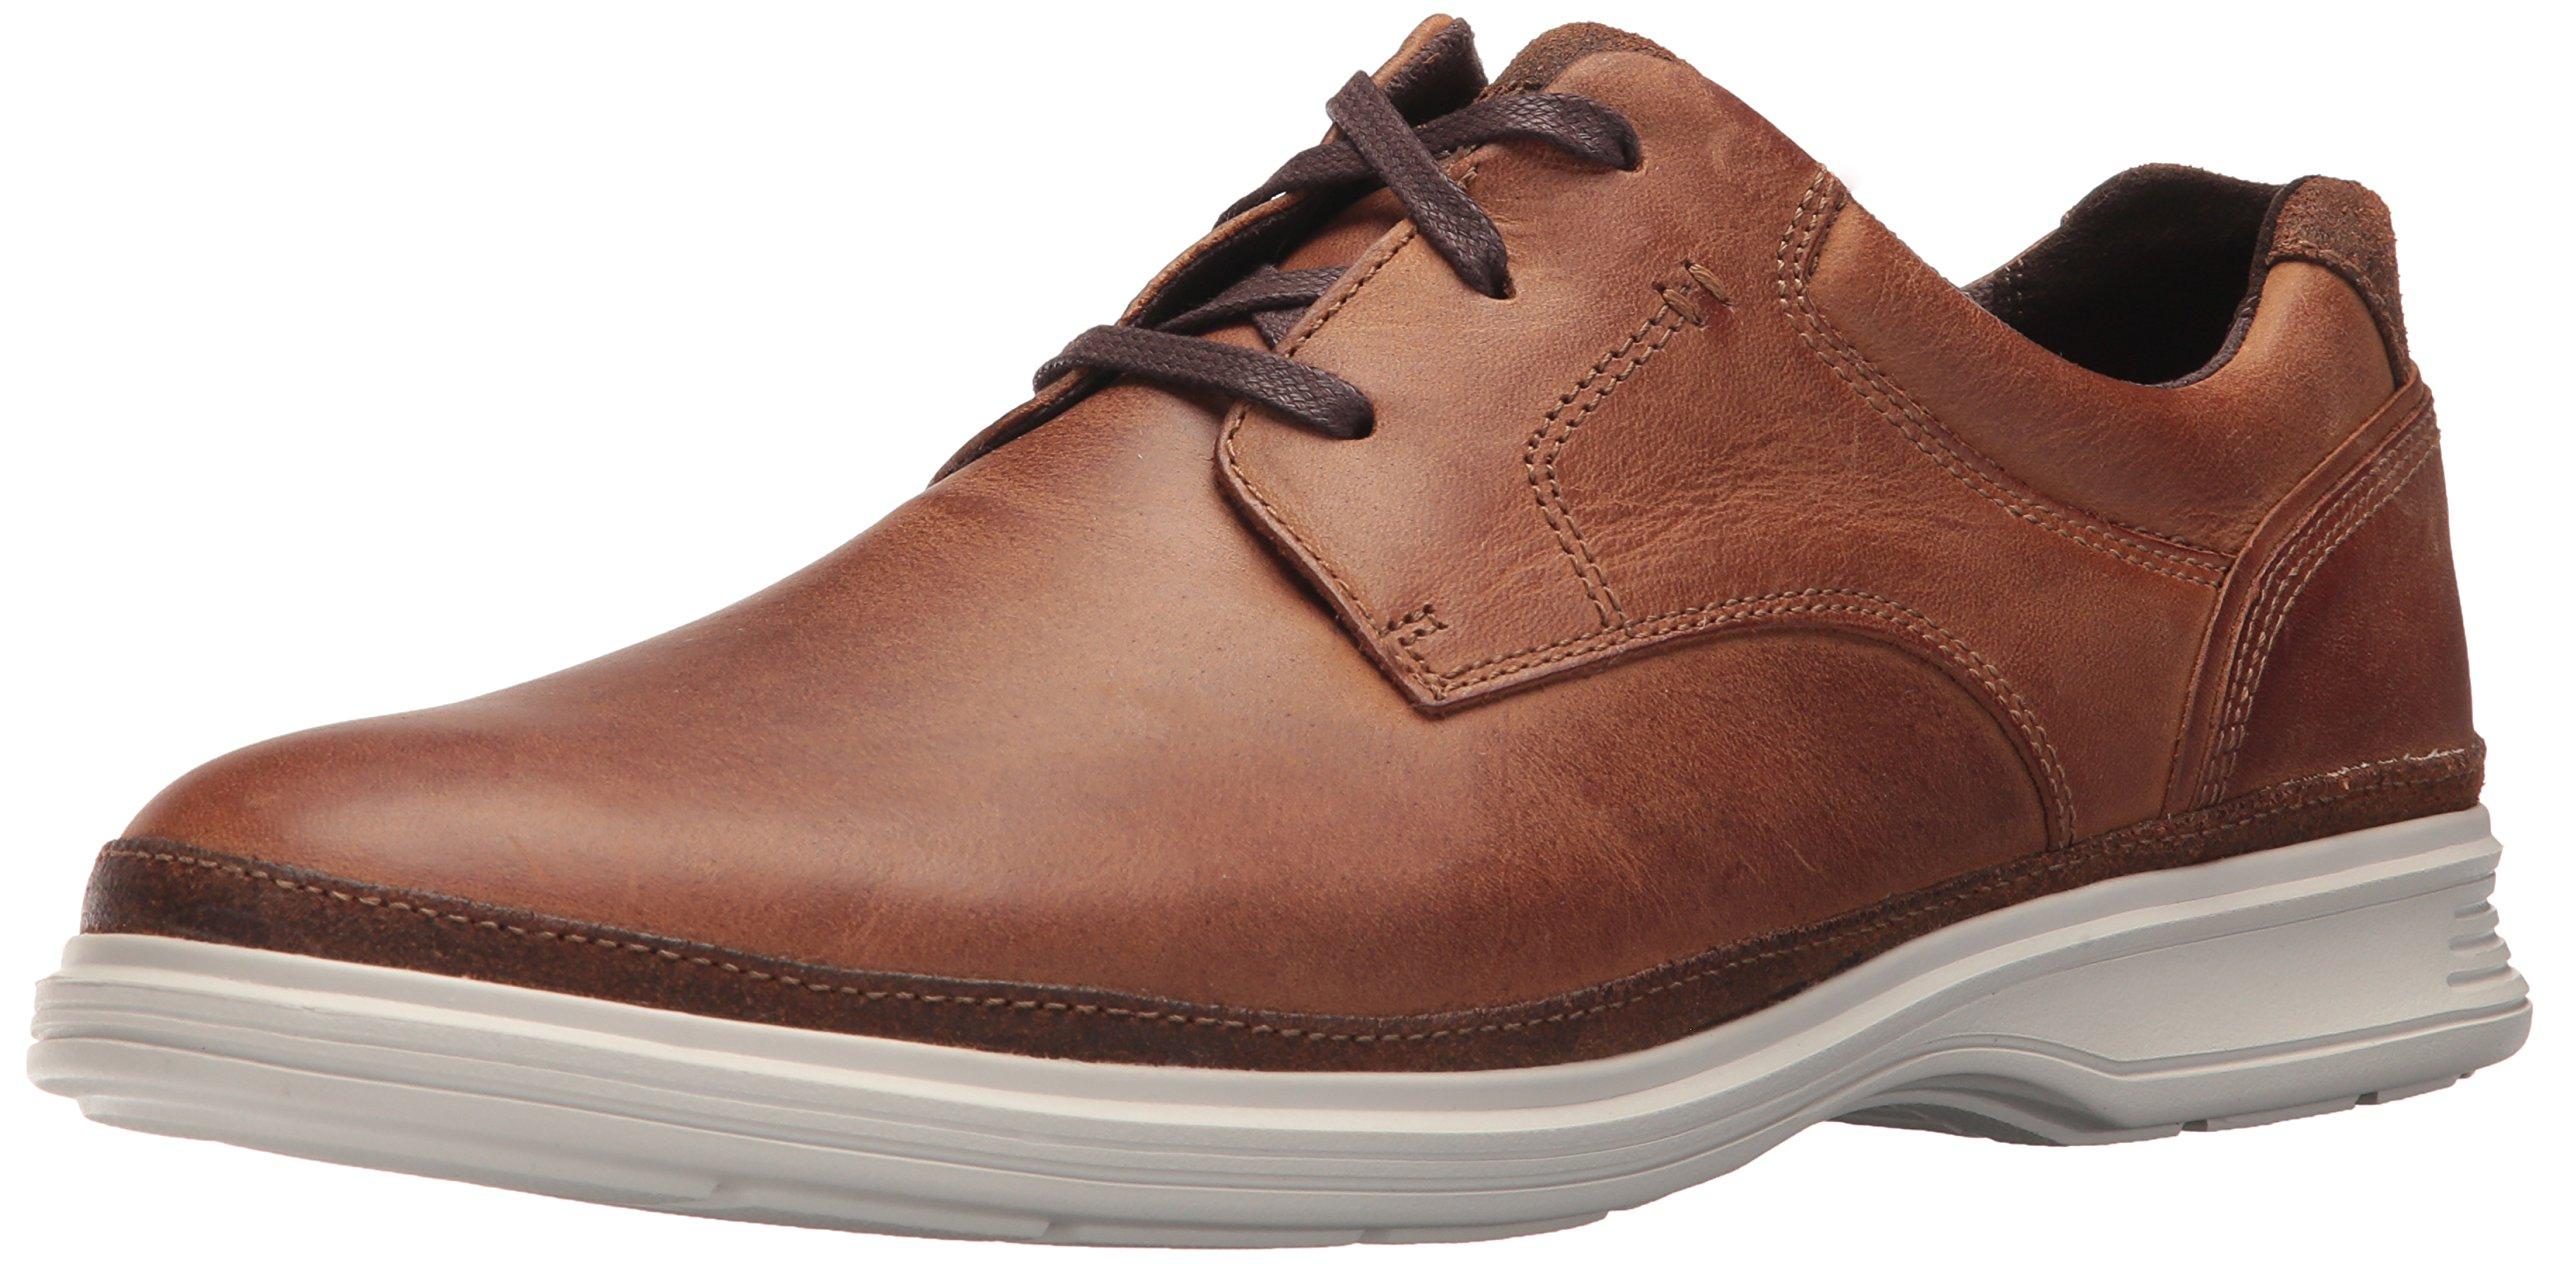 Rockport Men's DresSports 2 Go Plain Toe Shoe, new caramel, 13 M US